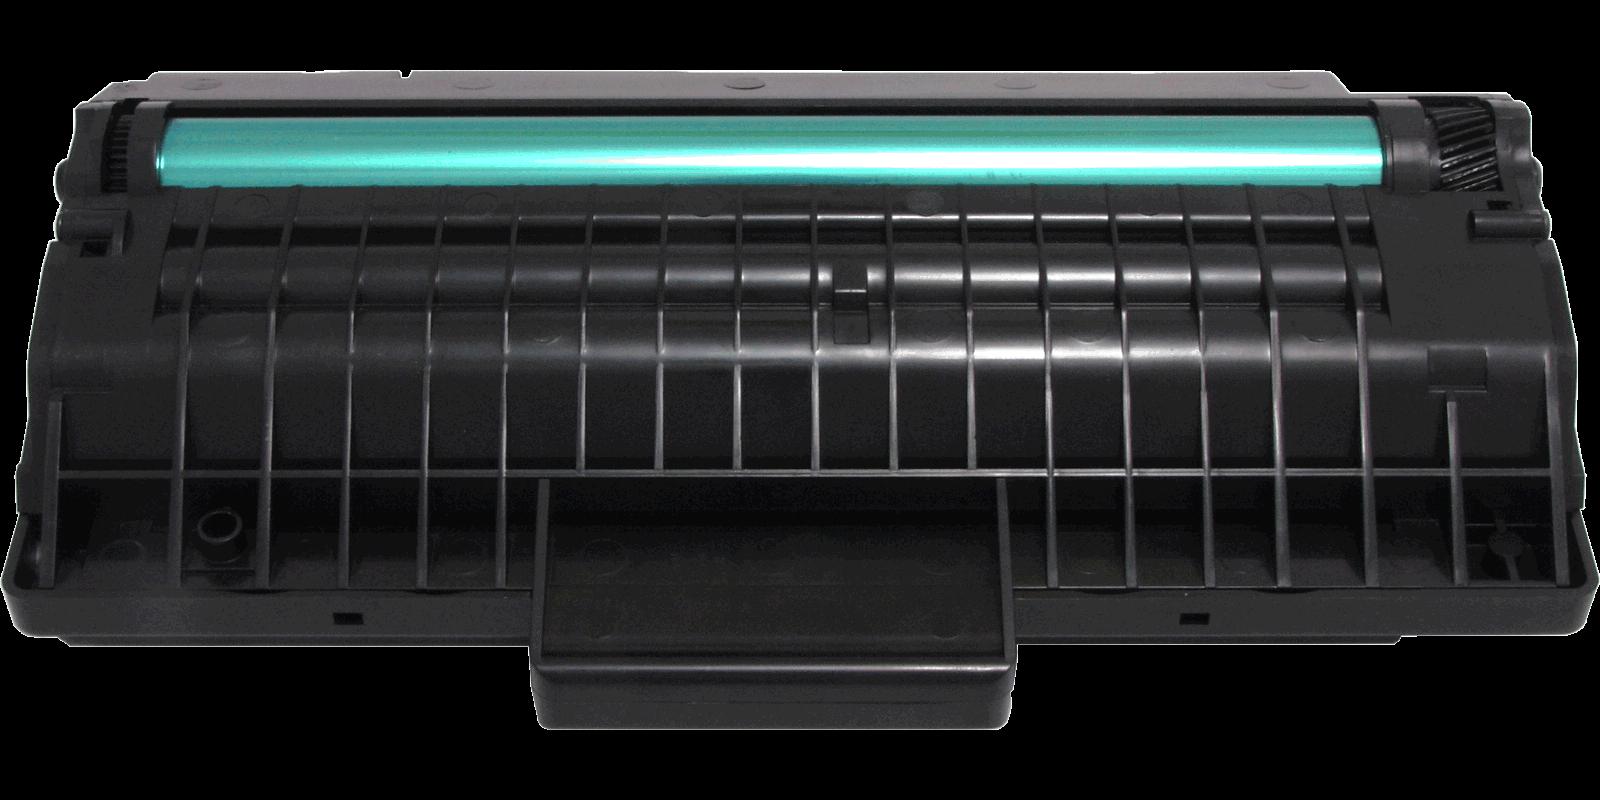 ULTRA SCX-D4200A, черный, для Samsung, до 3000 стр.